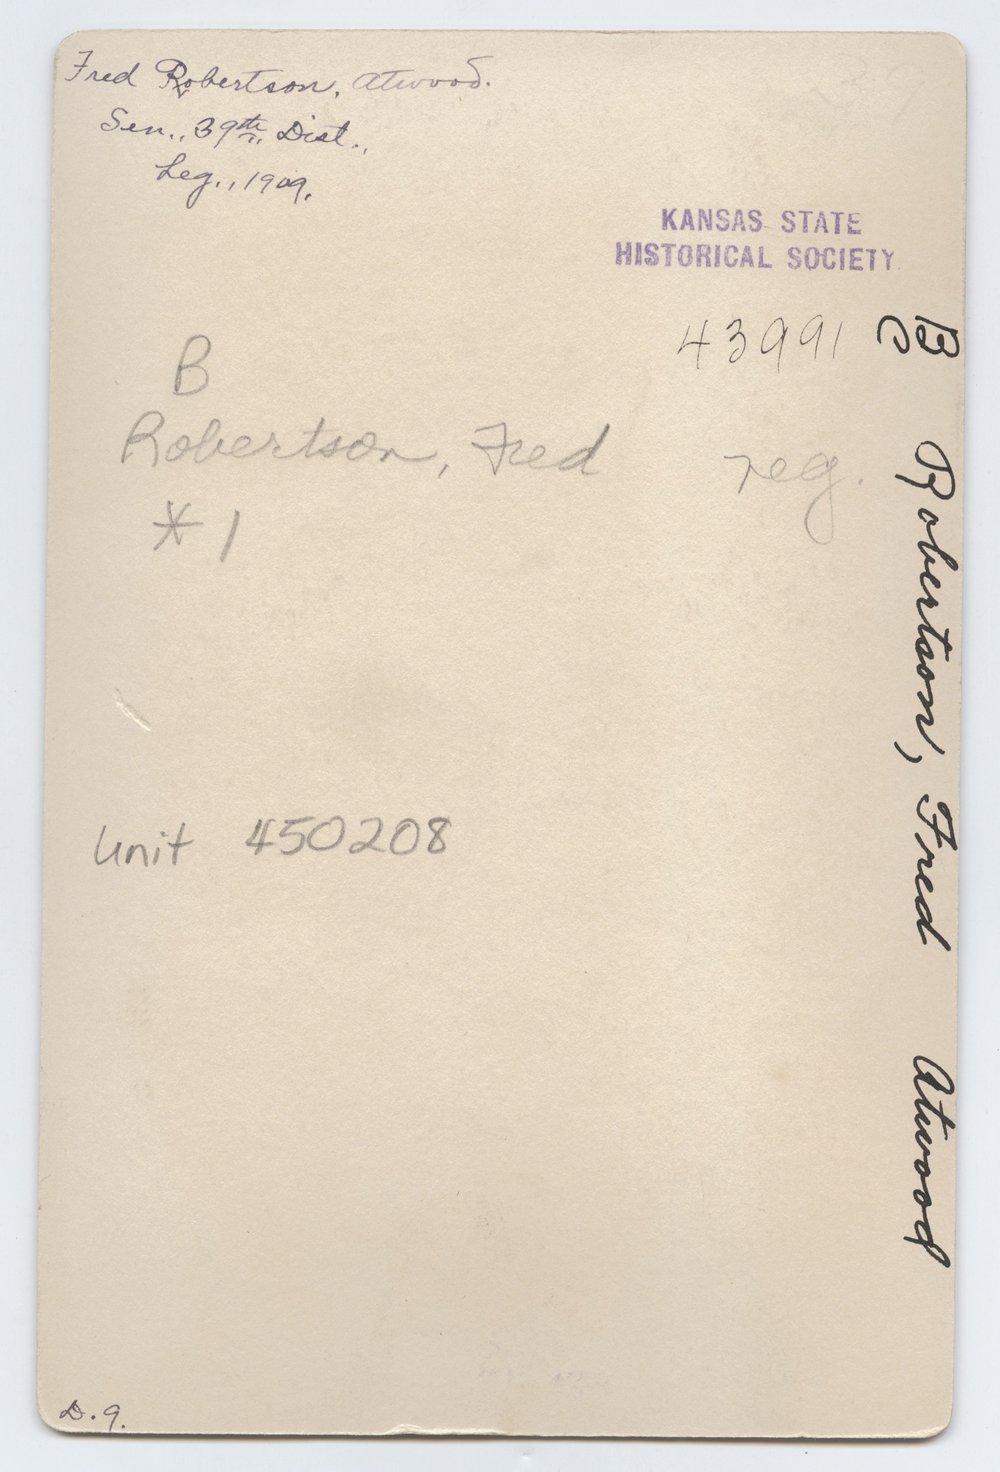 Fred Robertson - 2